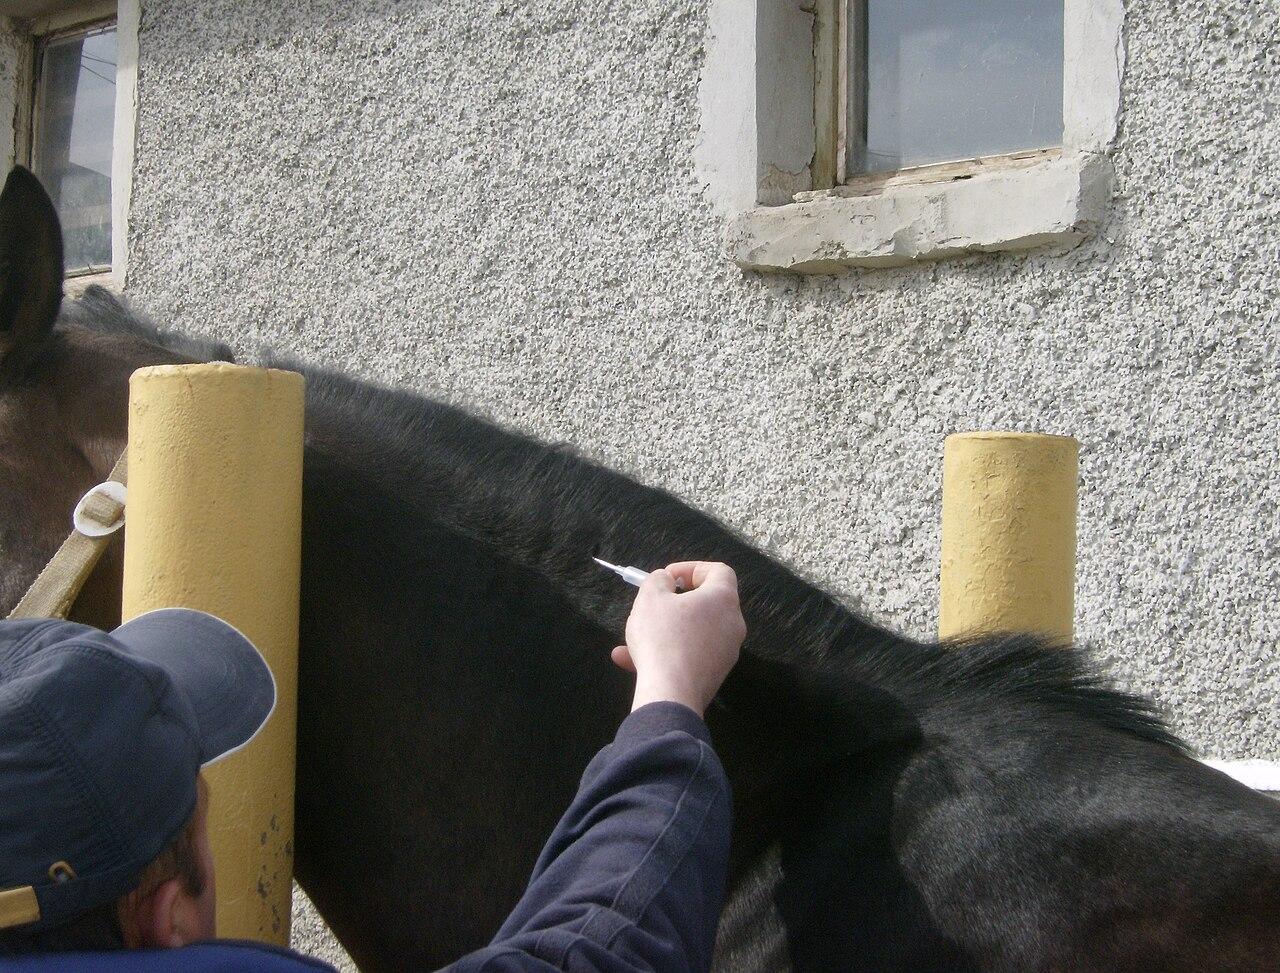 https://upload.wikimedia.org/wikipedia/commons/thumb/e/e5/Horse_microchiping_3.jpg/1280px-Horse_microchiping_3.jpg